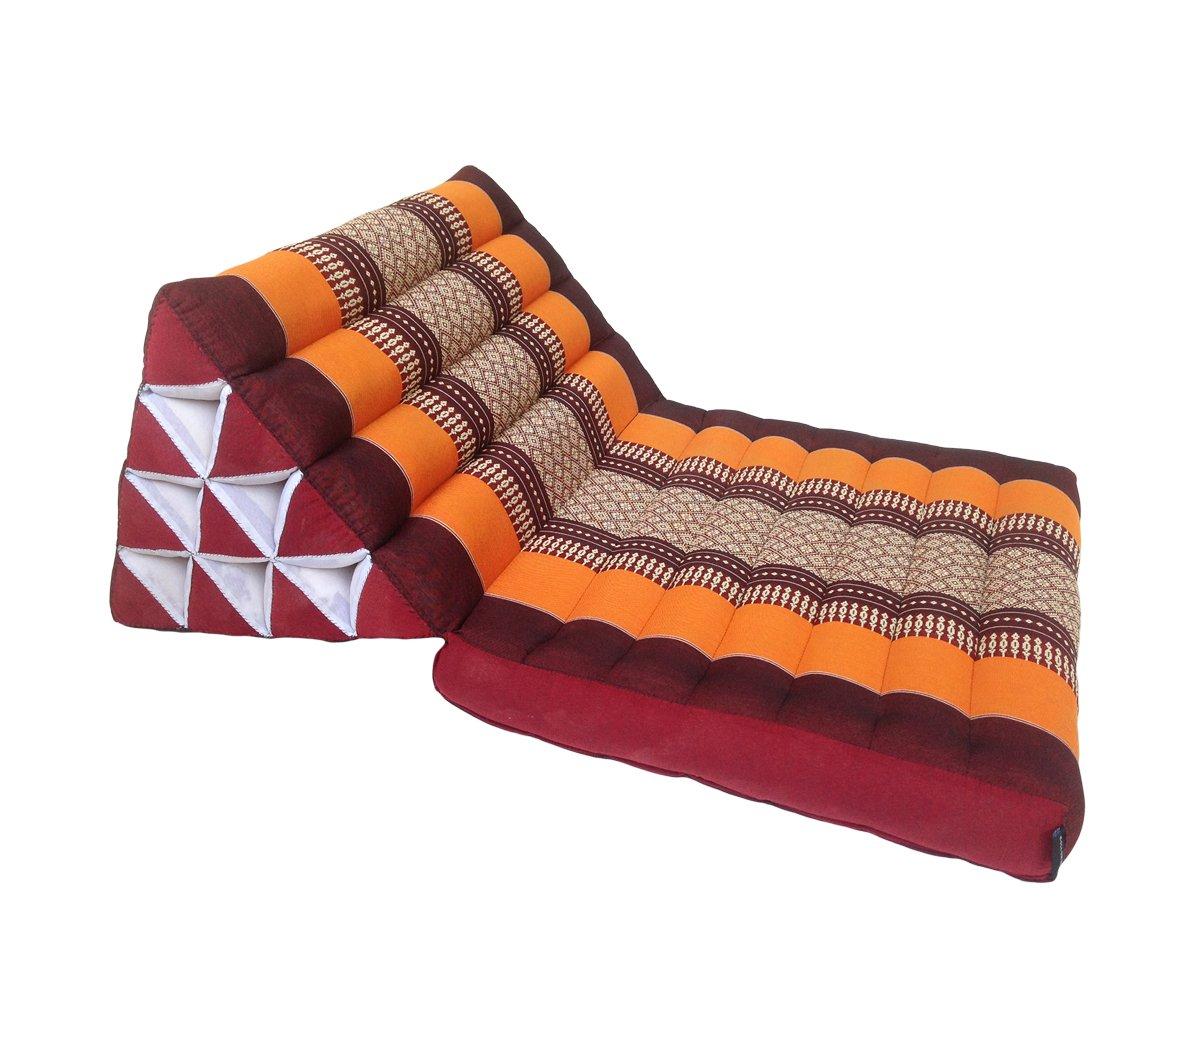 Colchón de meditación tradicional Thai Kapok, con cojín de respaldo, estilo oriental tradicional, para yoga, masaje o relajación, se puede plegar: ...